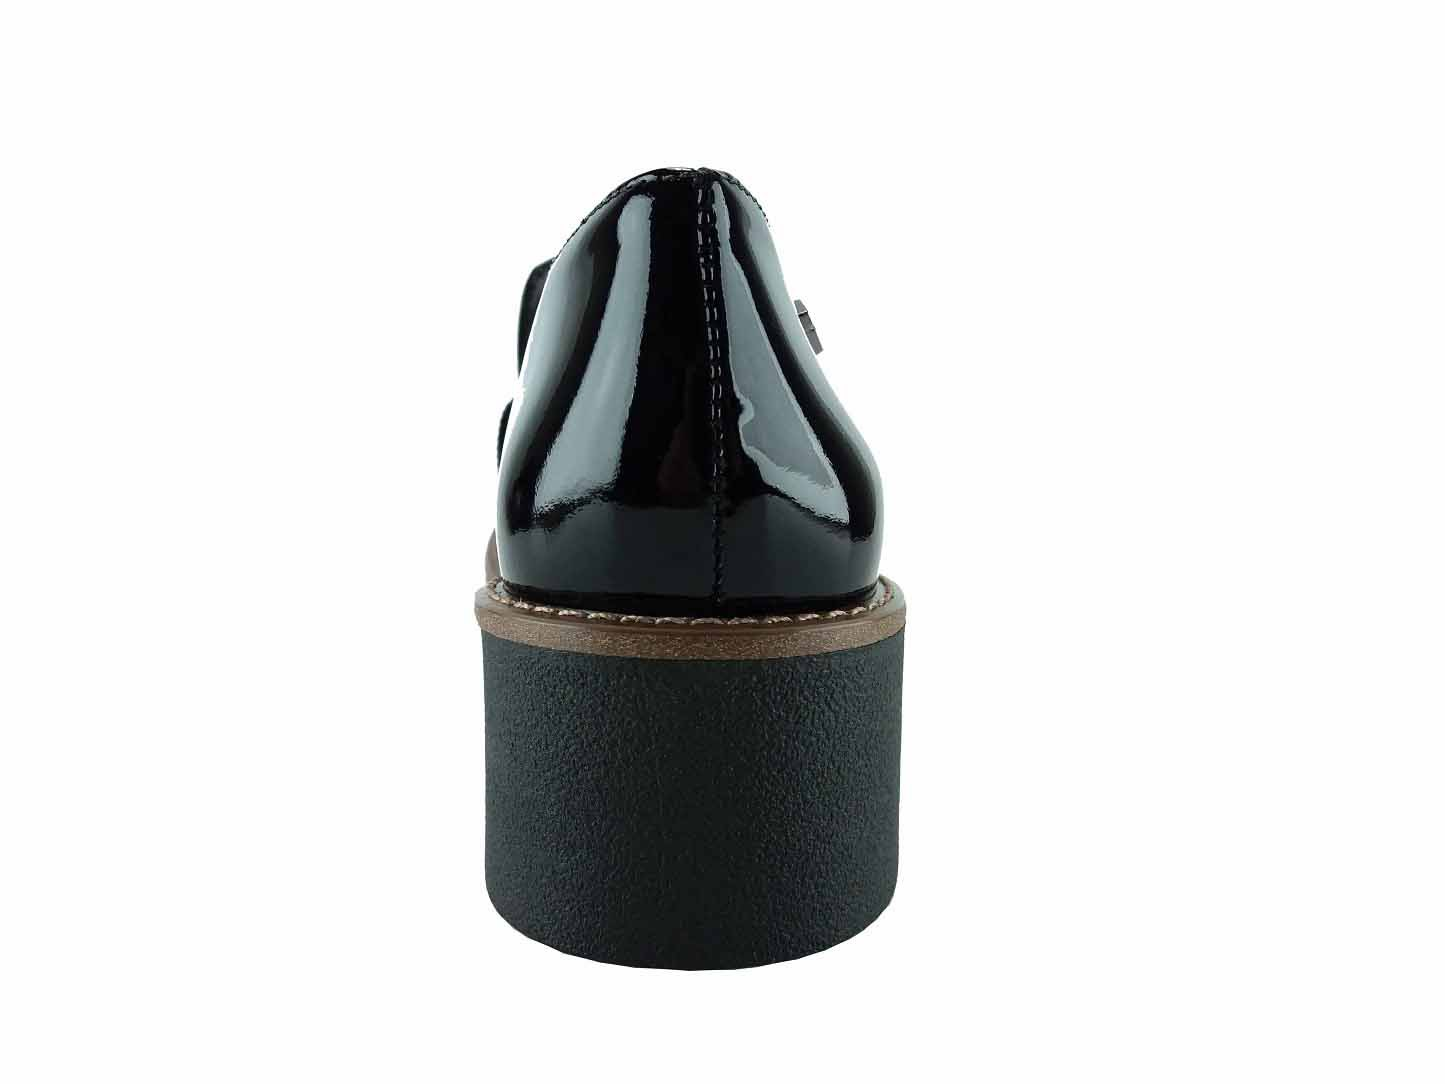 Sapato Loafer Feminino Verniz Preto Fusion Cristófoli